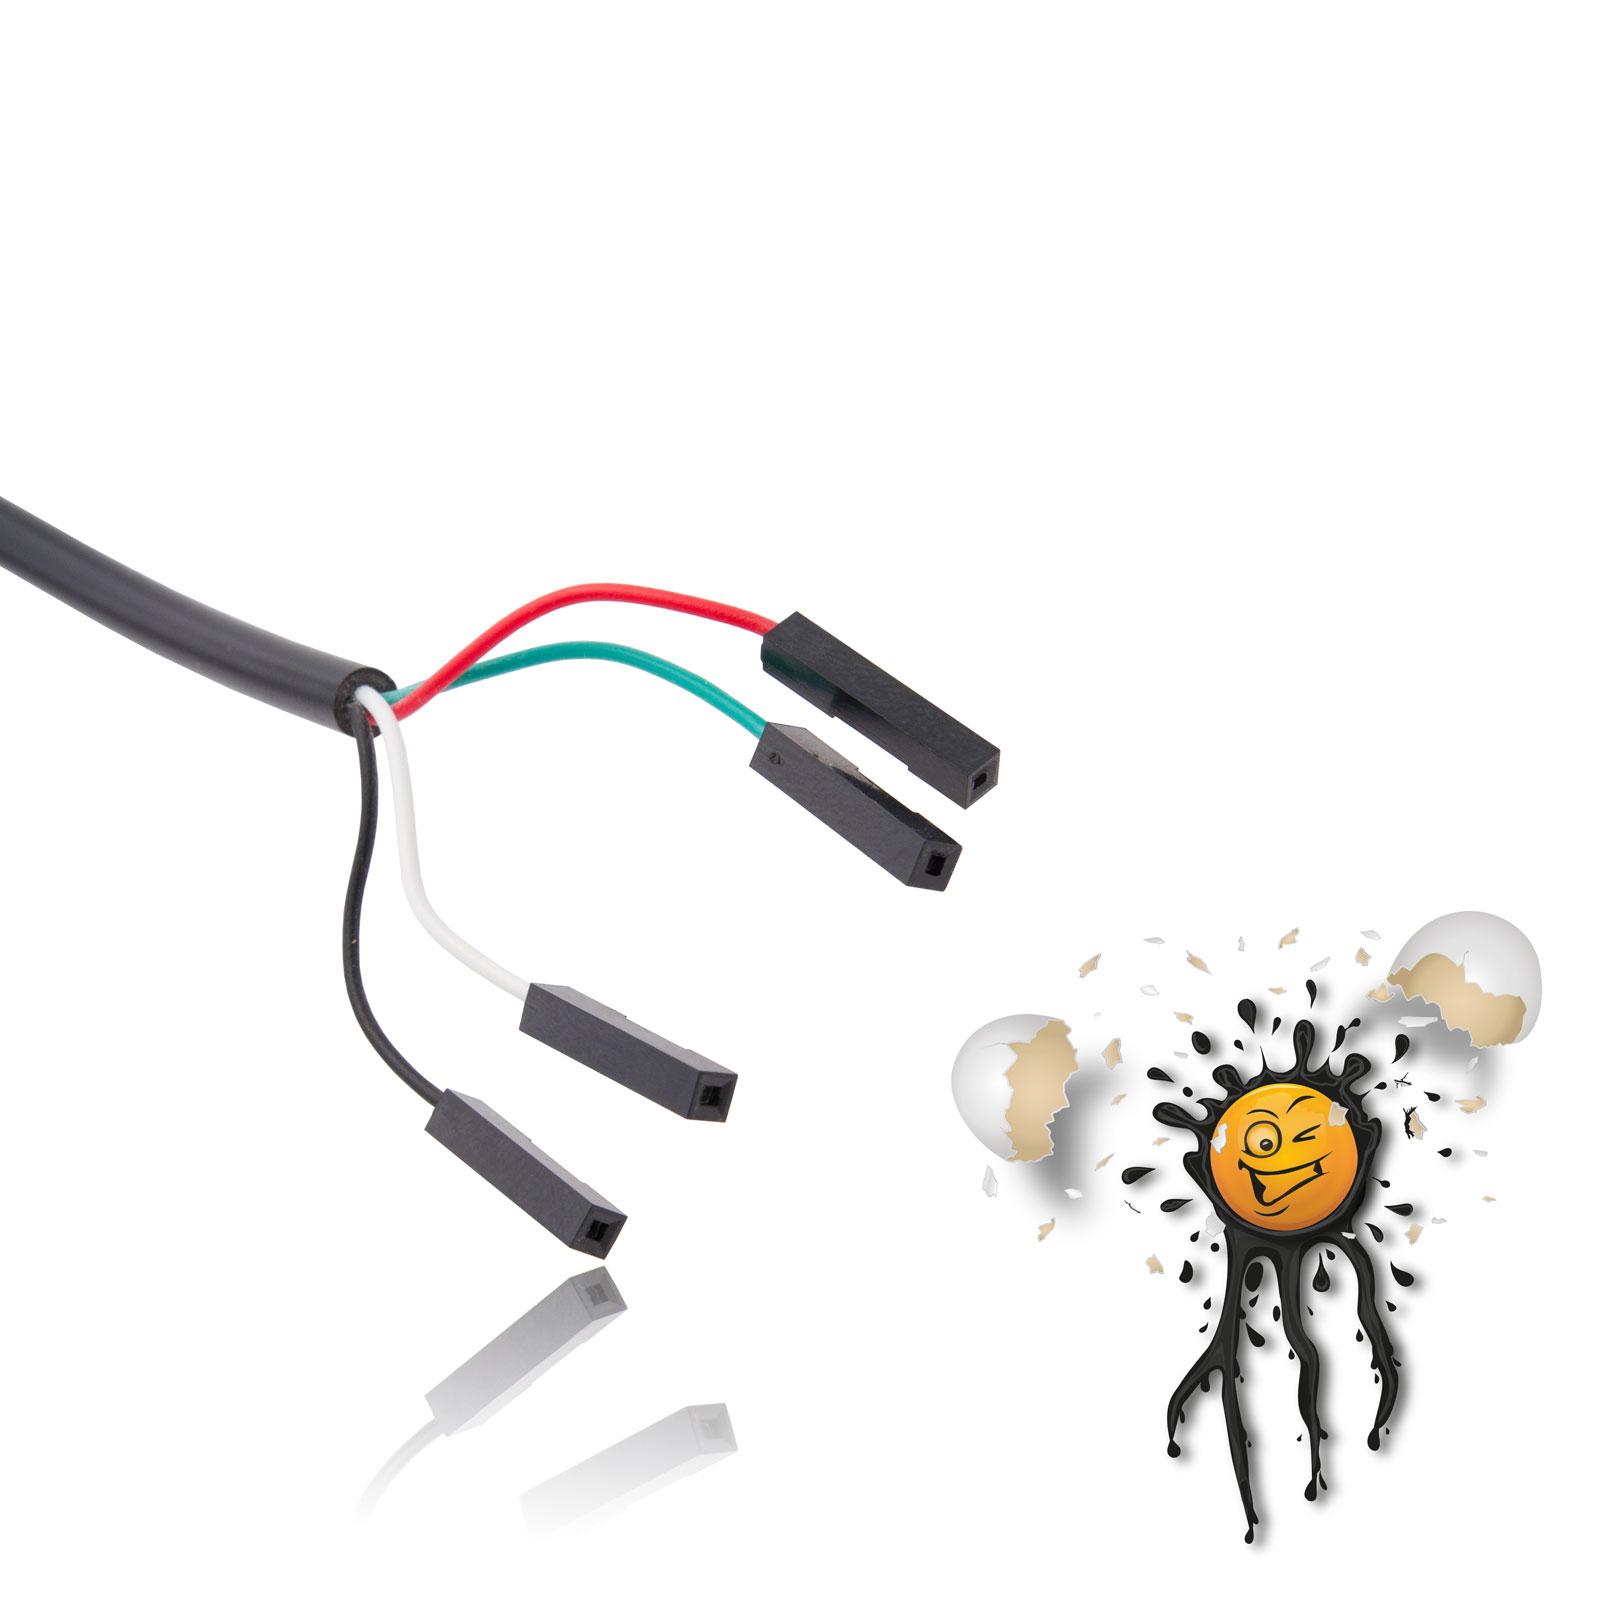 Prolific PL2303 USB TTL Anschlüsse